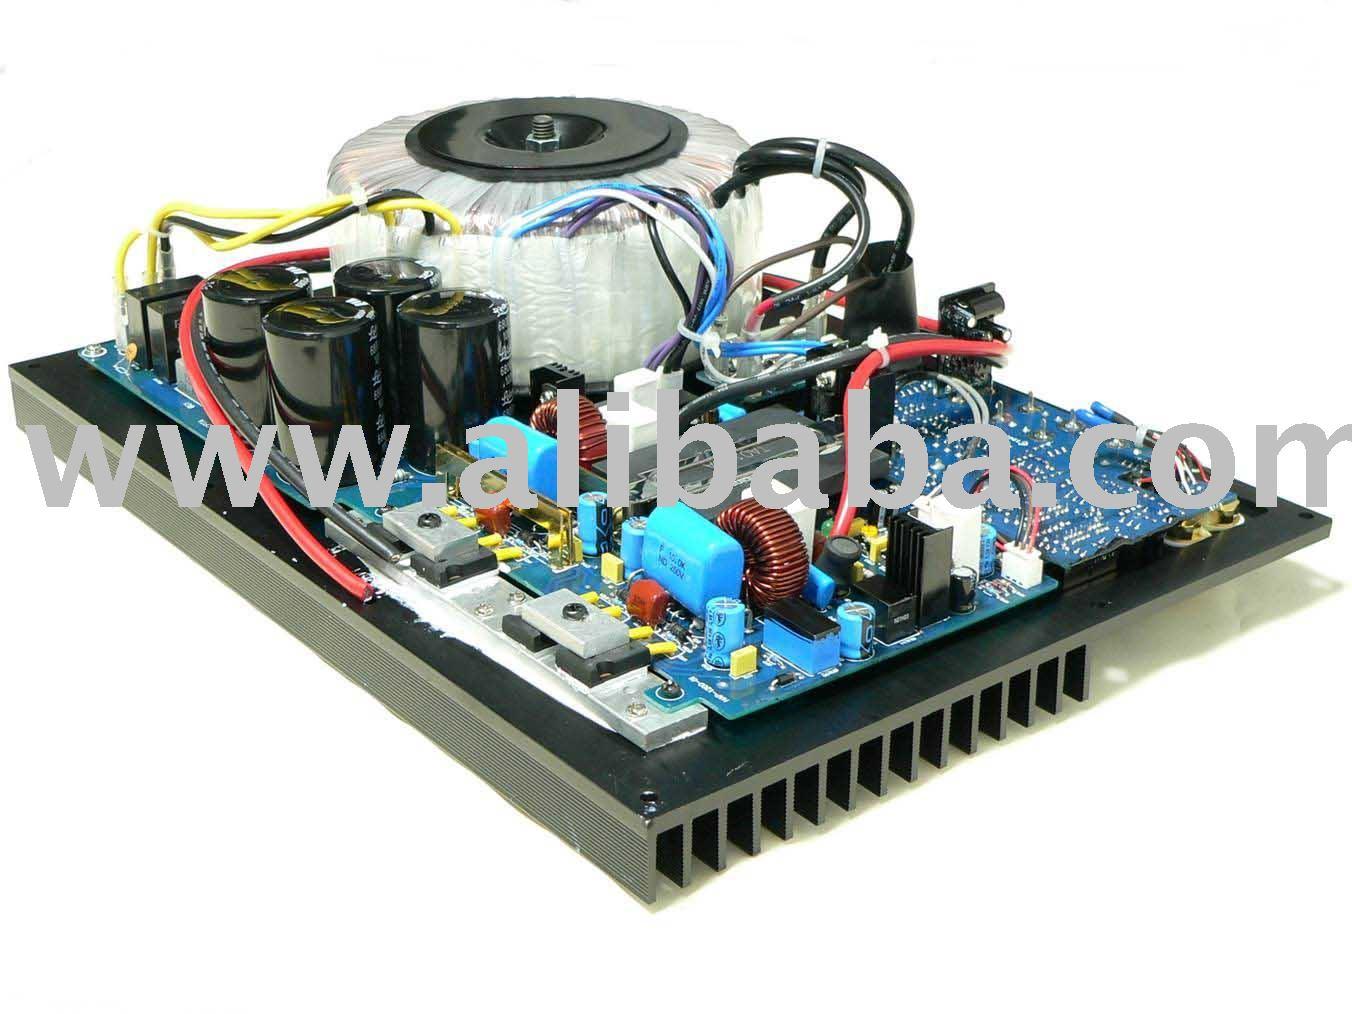 Class T 1000w Digital Subwoofer Amplifier Buy Product On